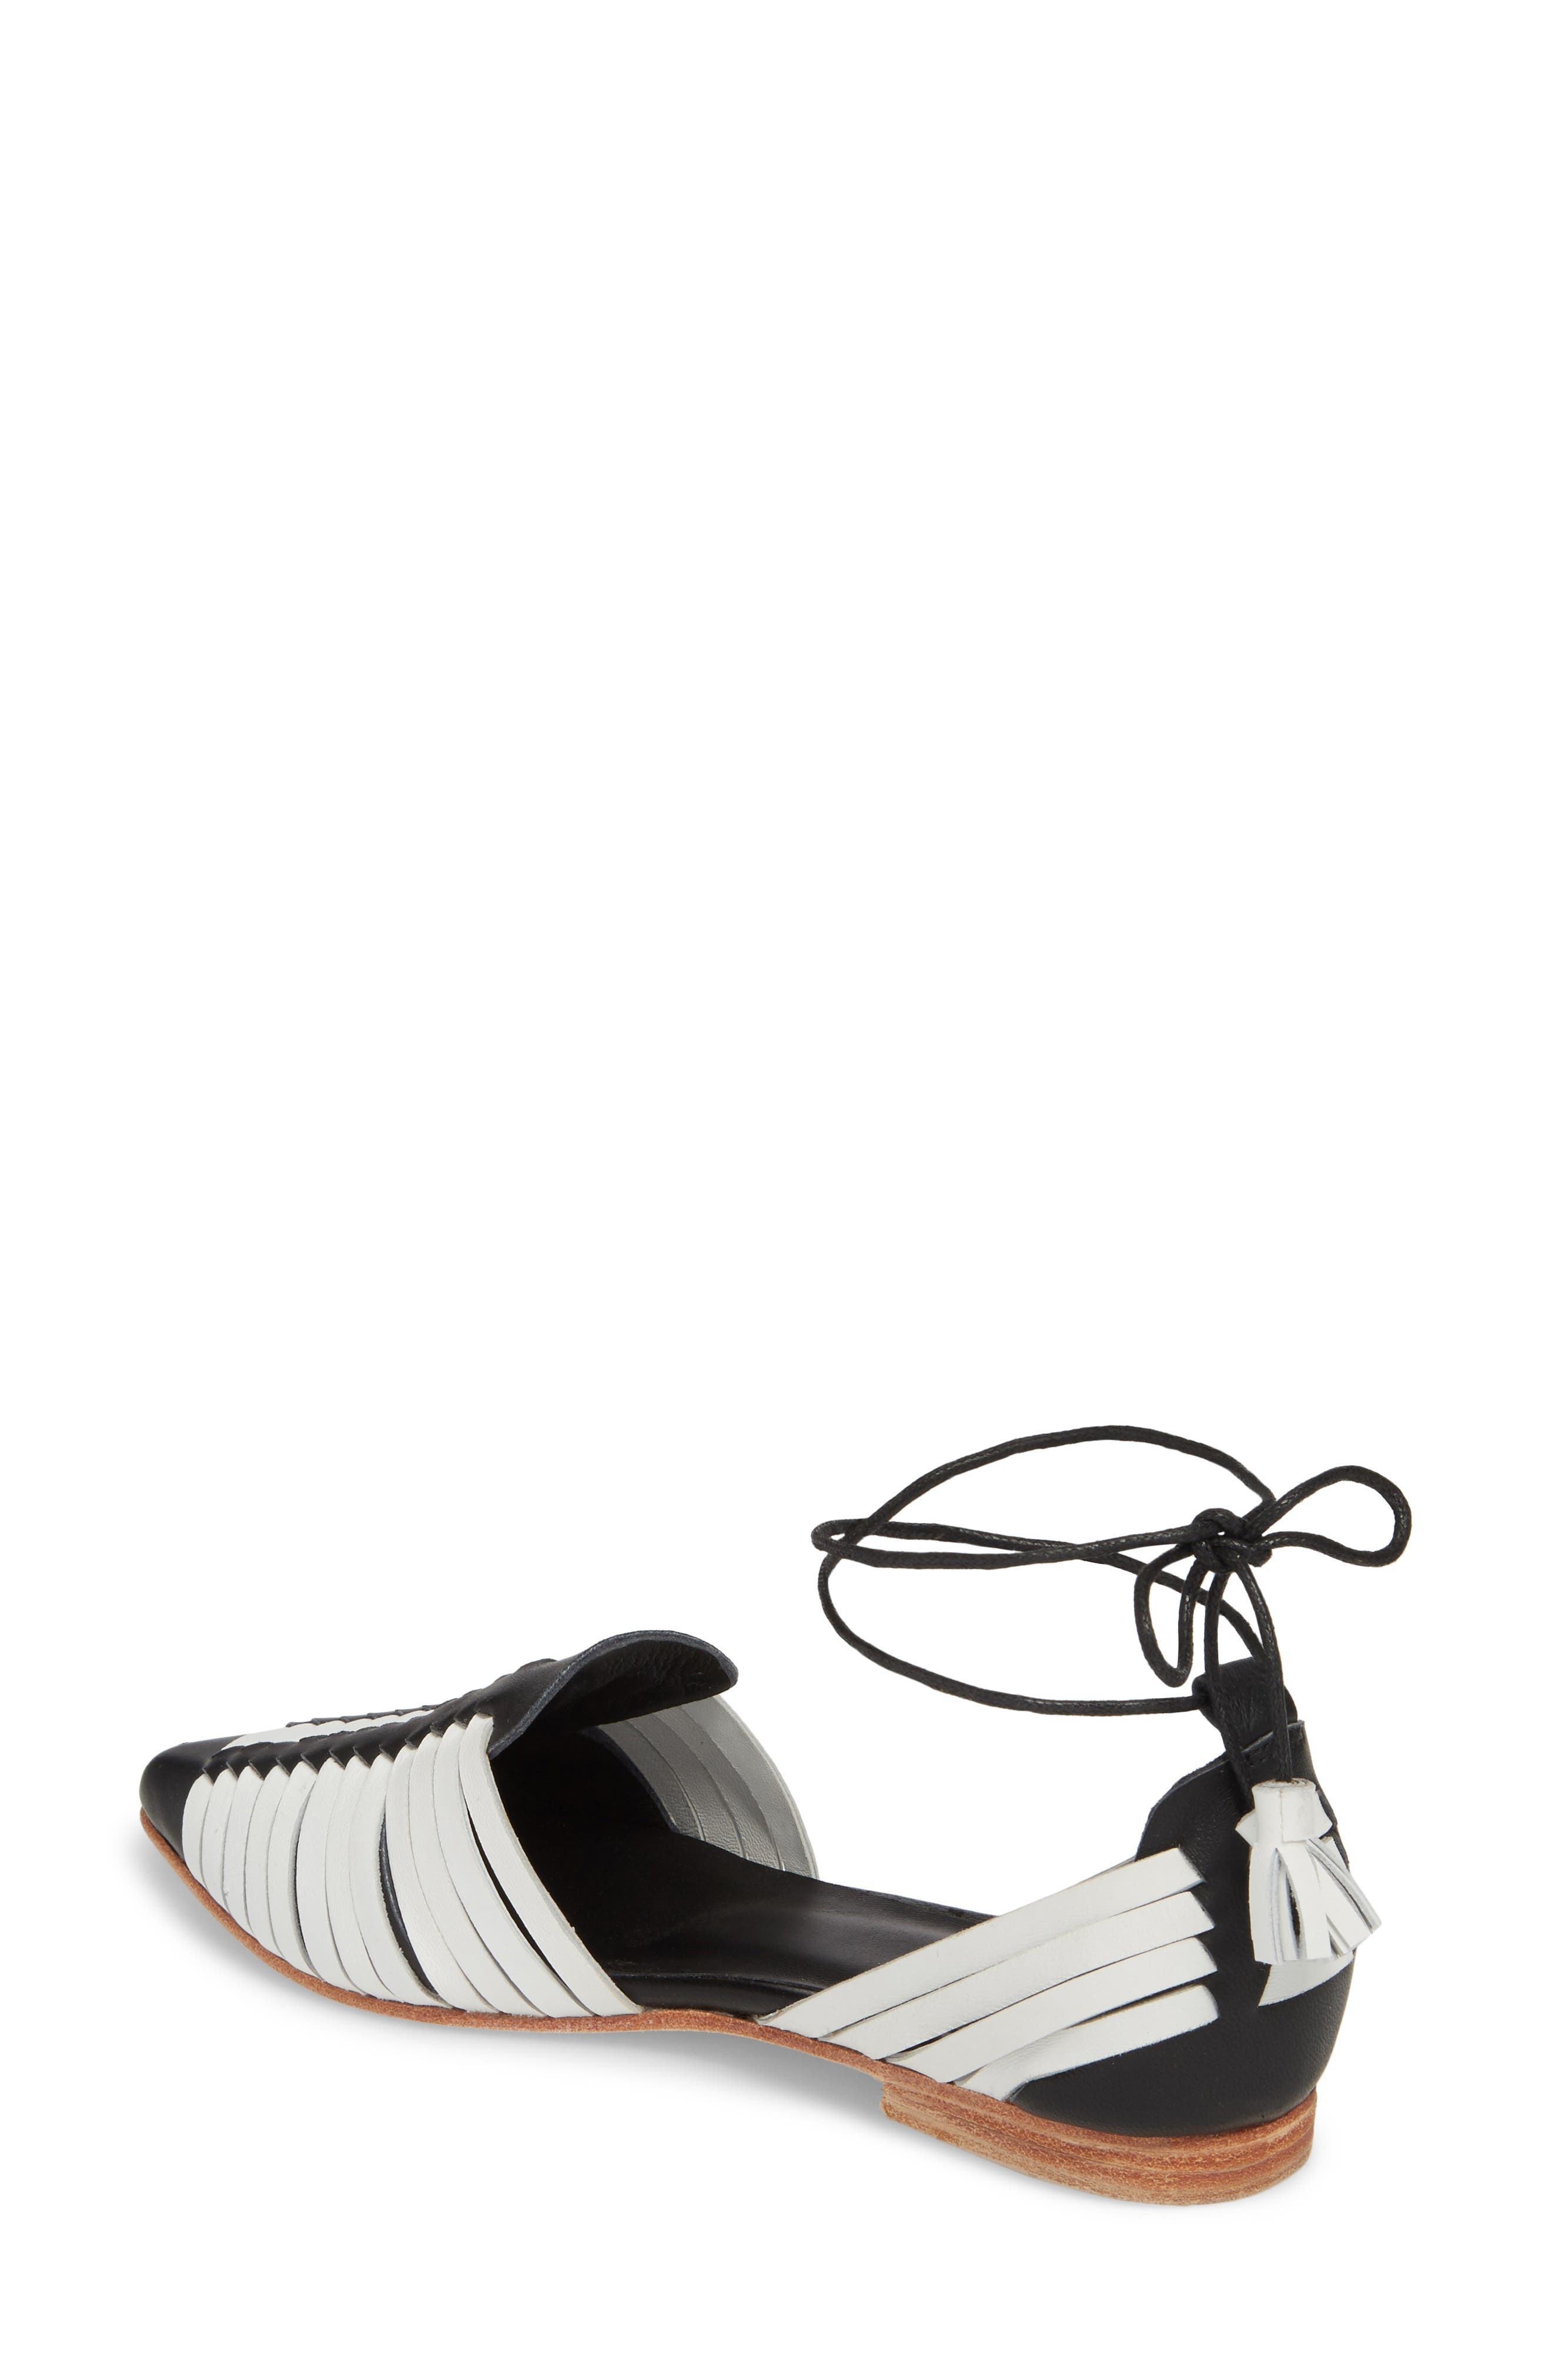 Hollis Huarache Ankle Tie Flat,                             Alternate thumbnail 2, color,                             BLACK/ WHITE LEATHER